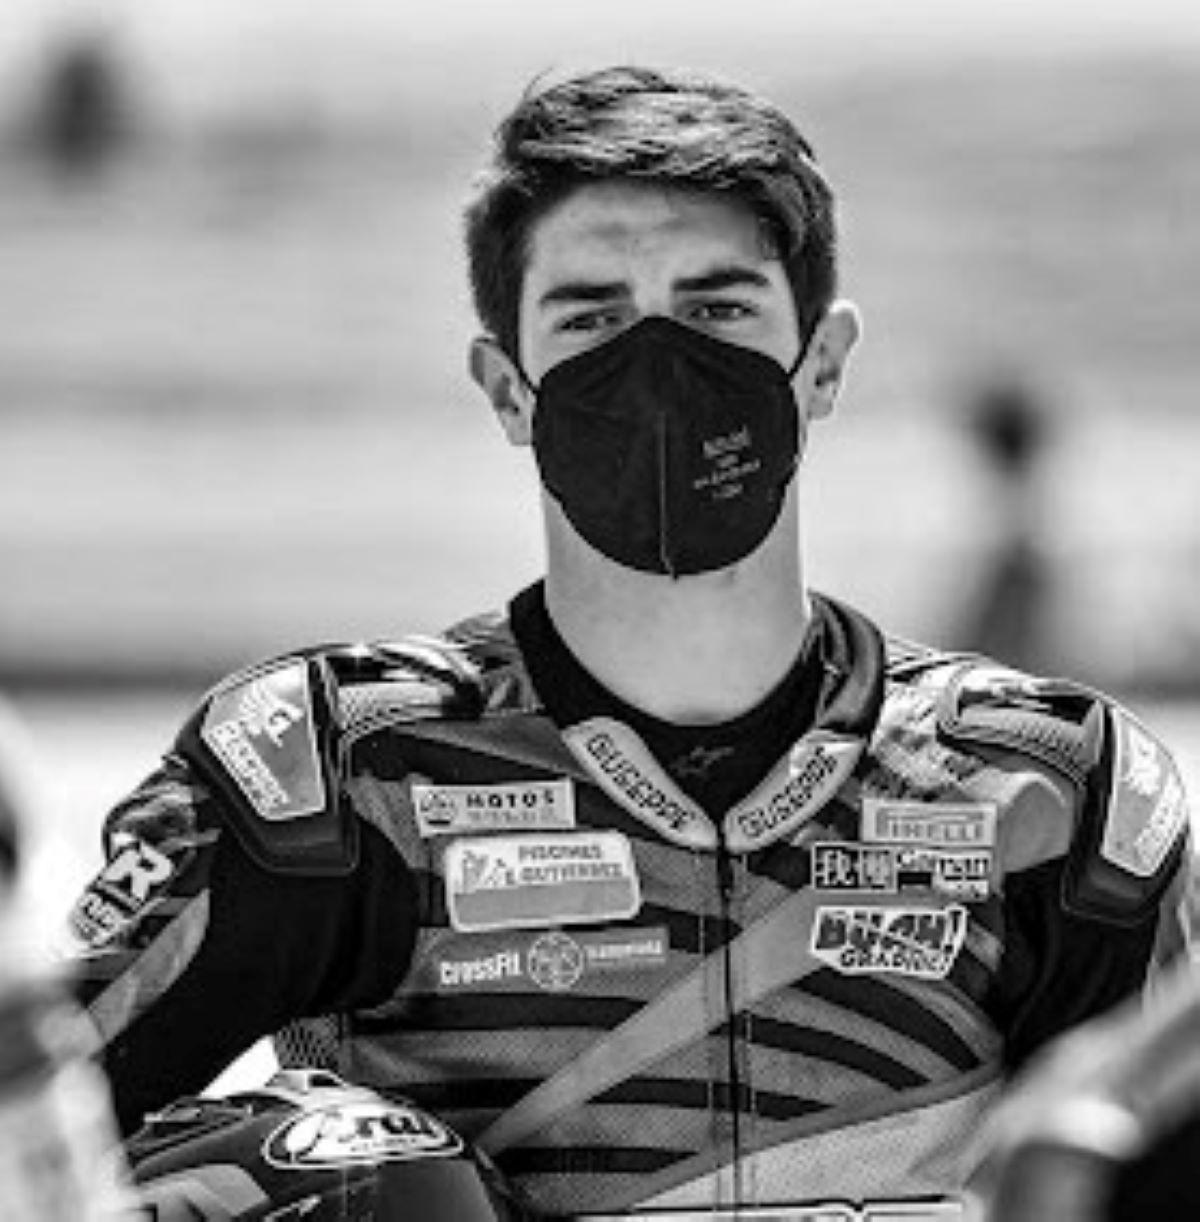 Lutto Motociclismo Morto Dean Berta Vinales Incidente Jerez